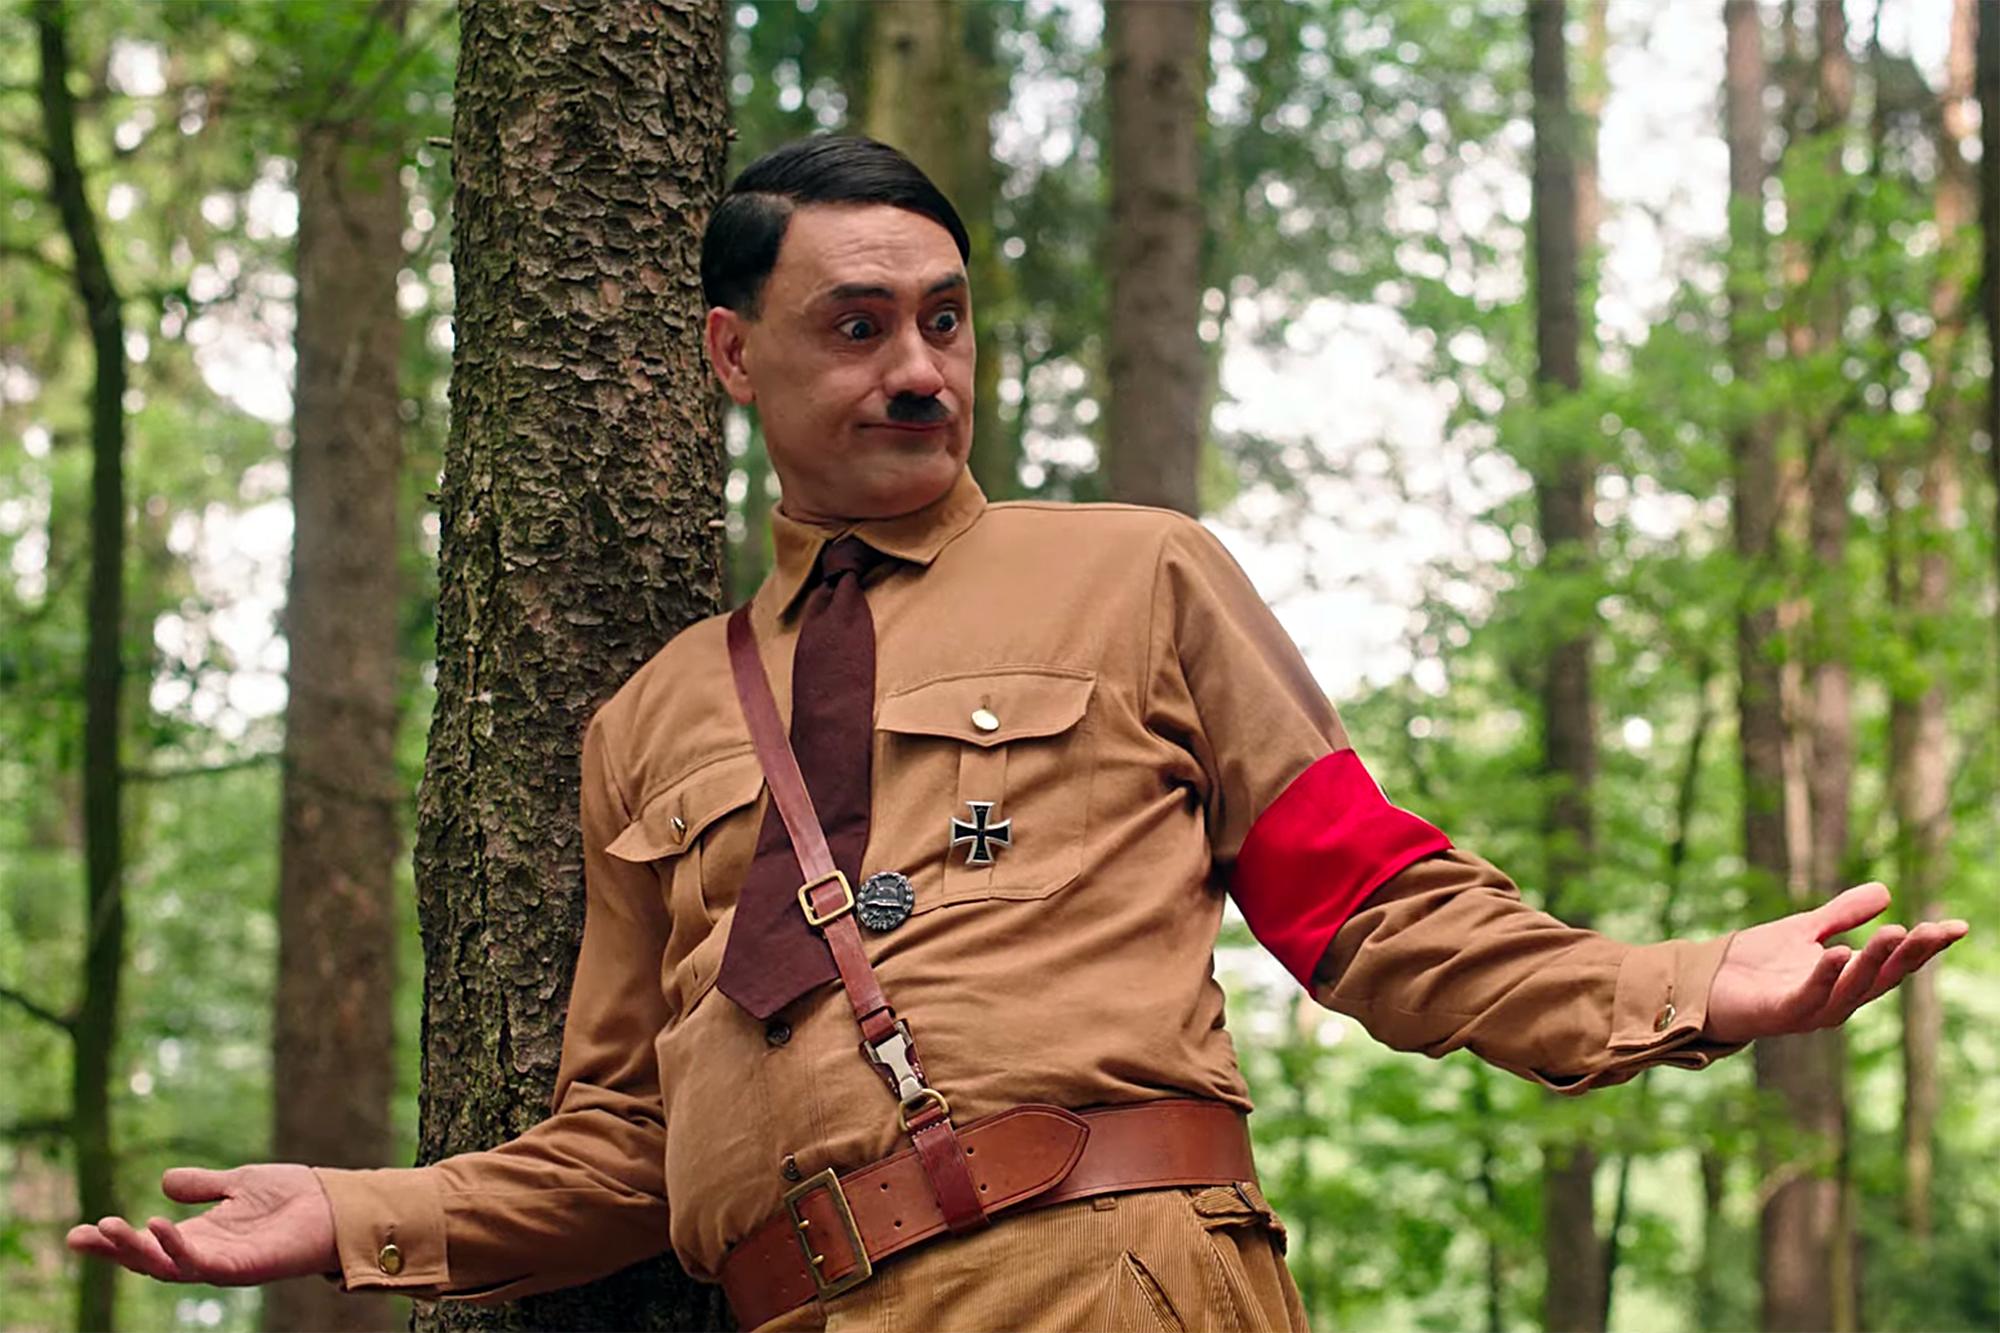 See the Trailer for Taika Waititi's World War II Satire 'JoJo Rabbit